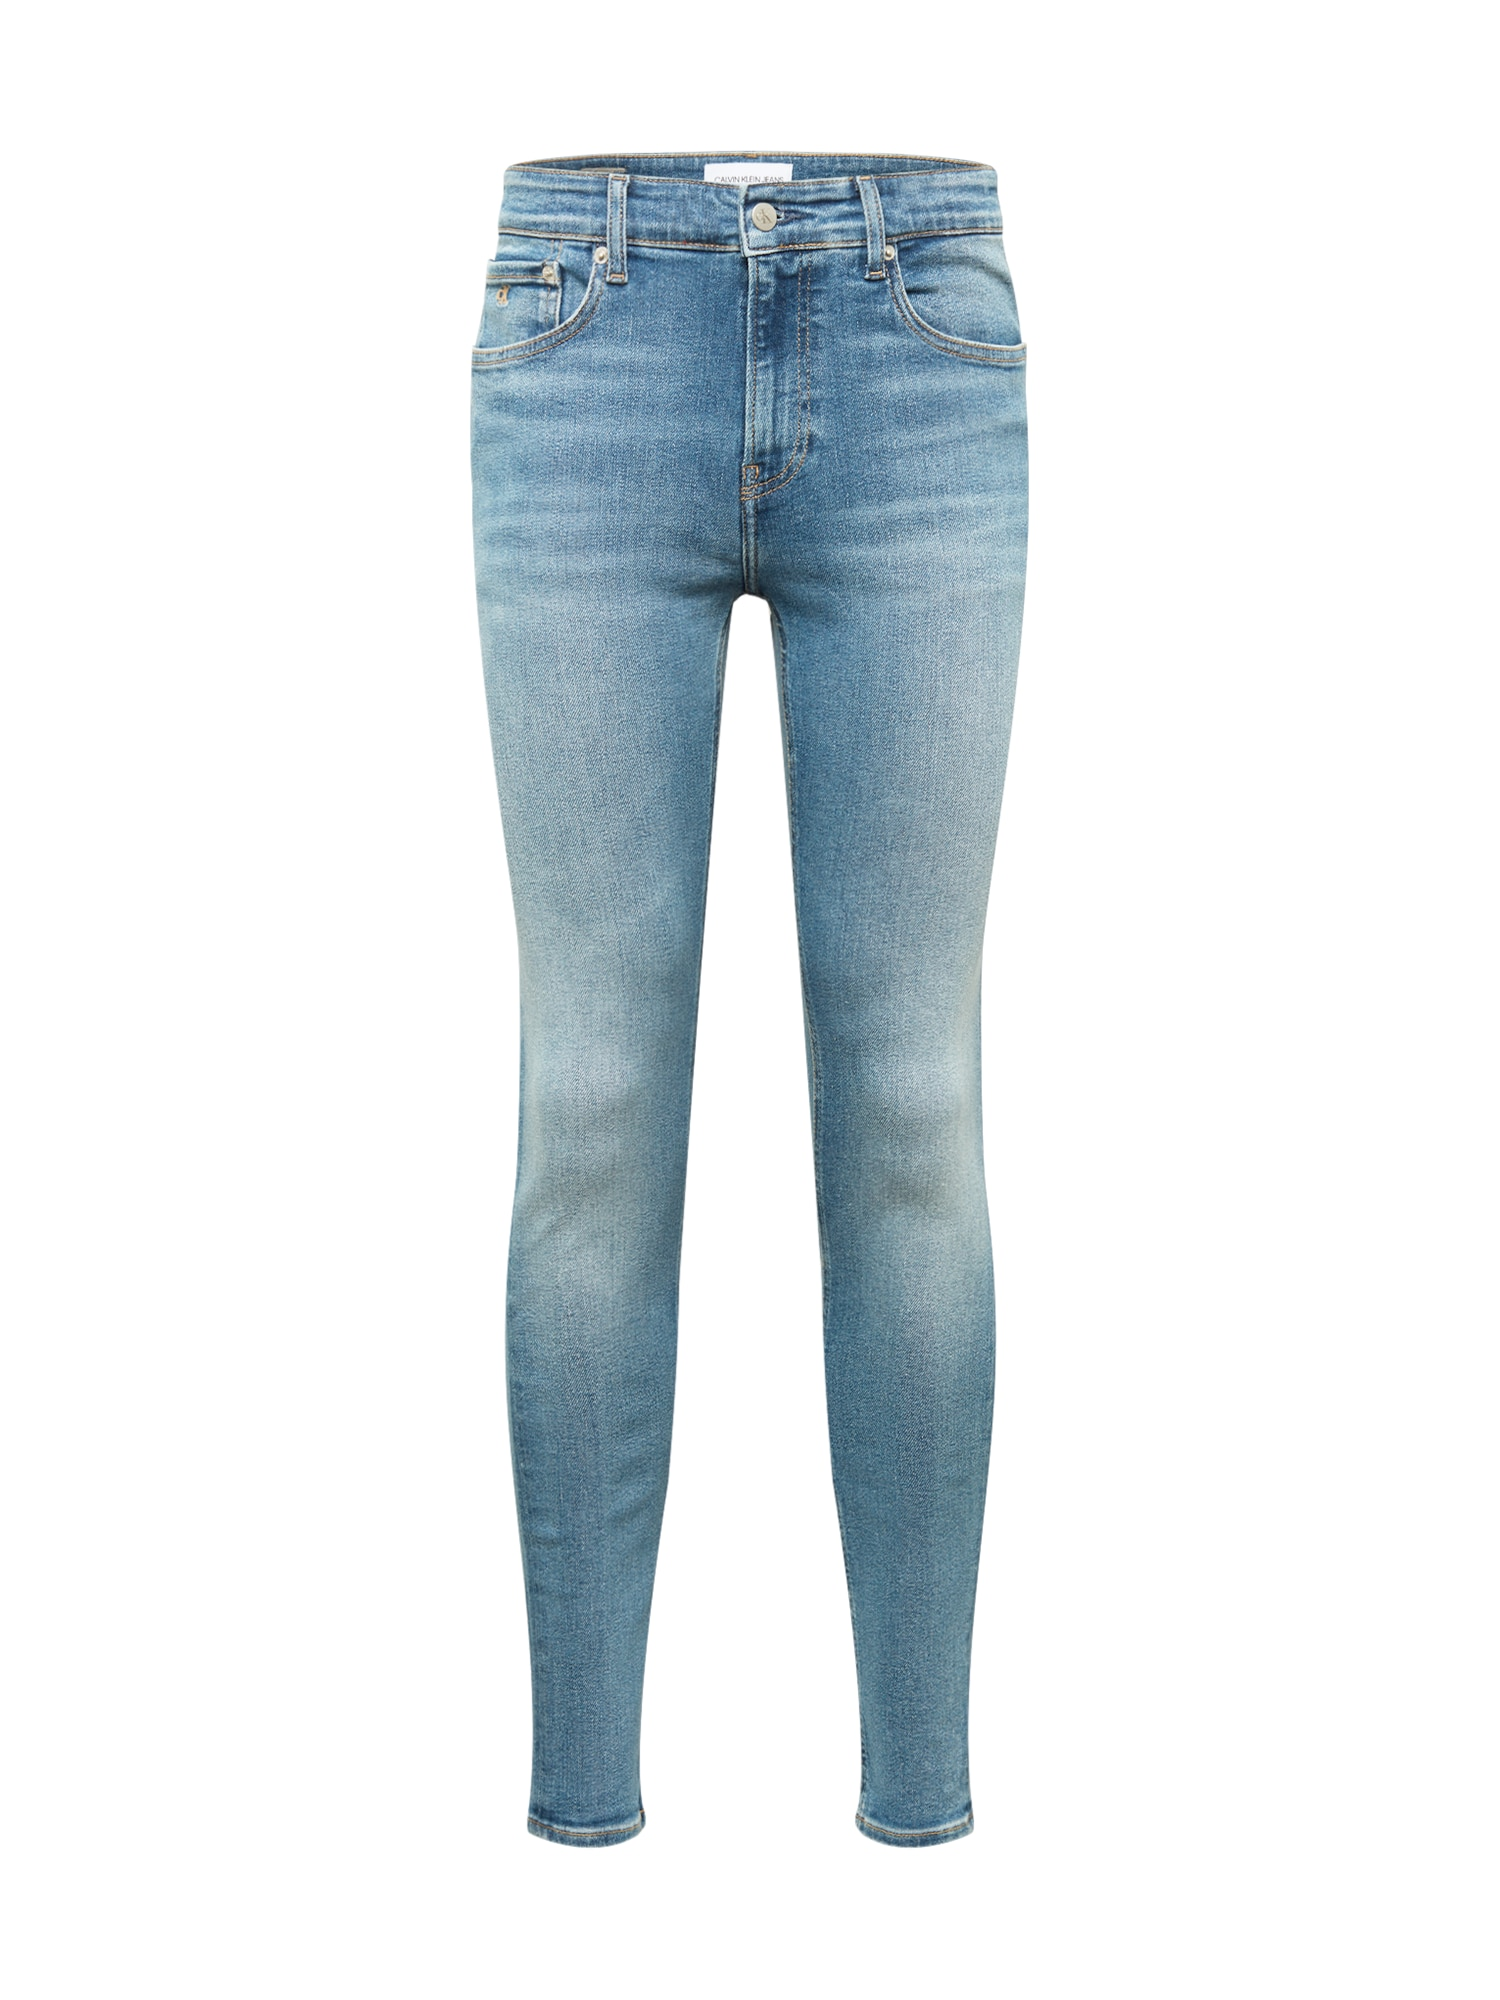 Calvin Klein Jeans Džinsai tamsiai (džinso) mėlyna / gelsvai pilka spalva / balta